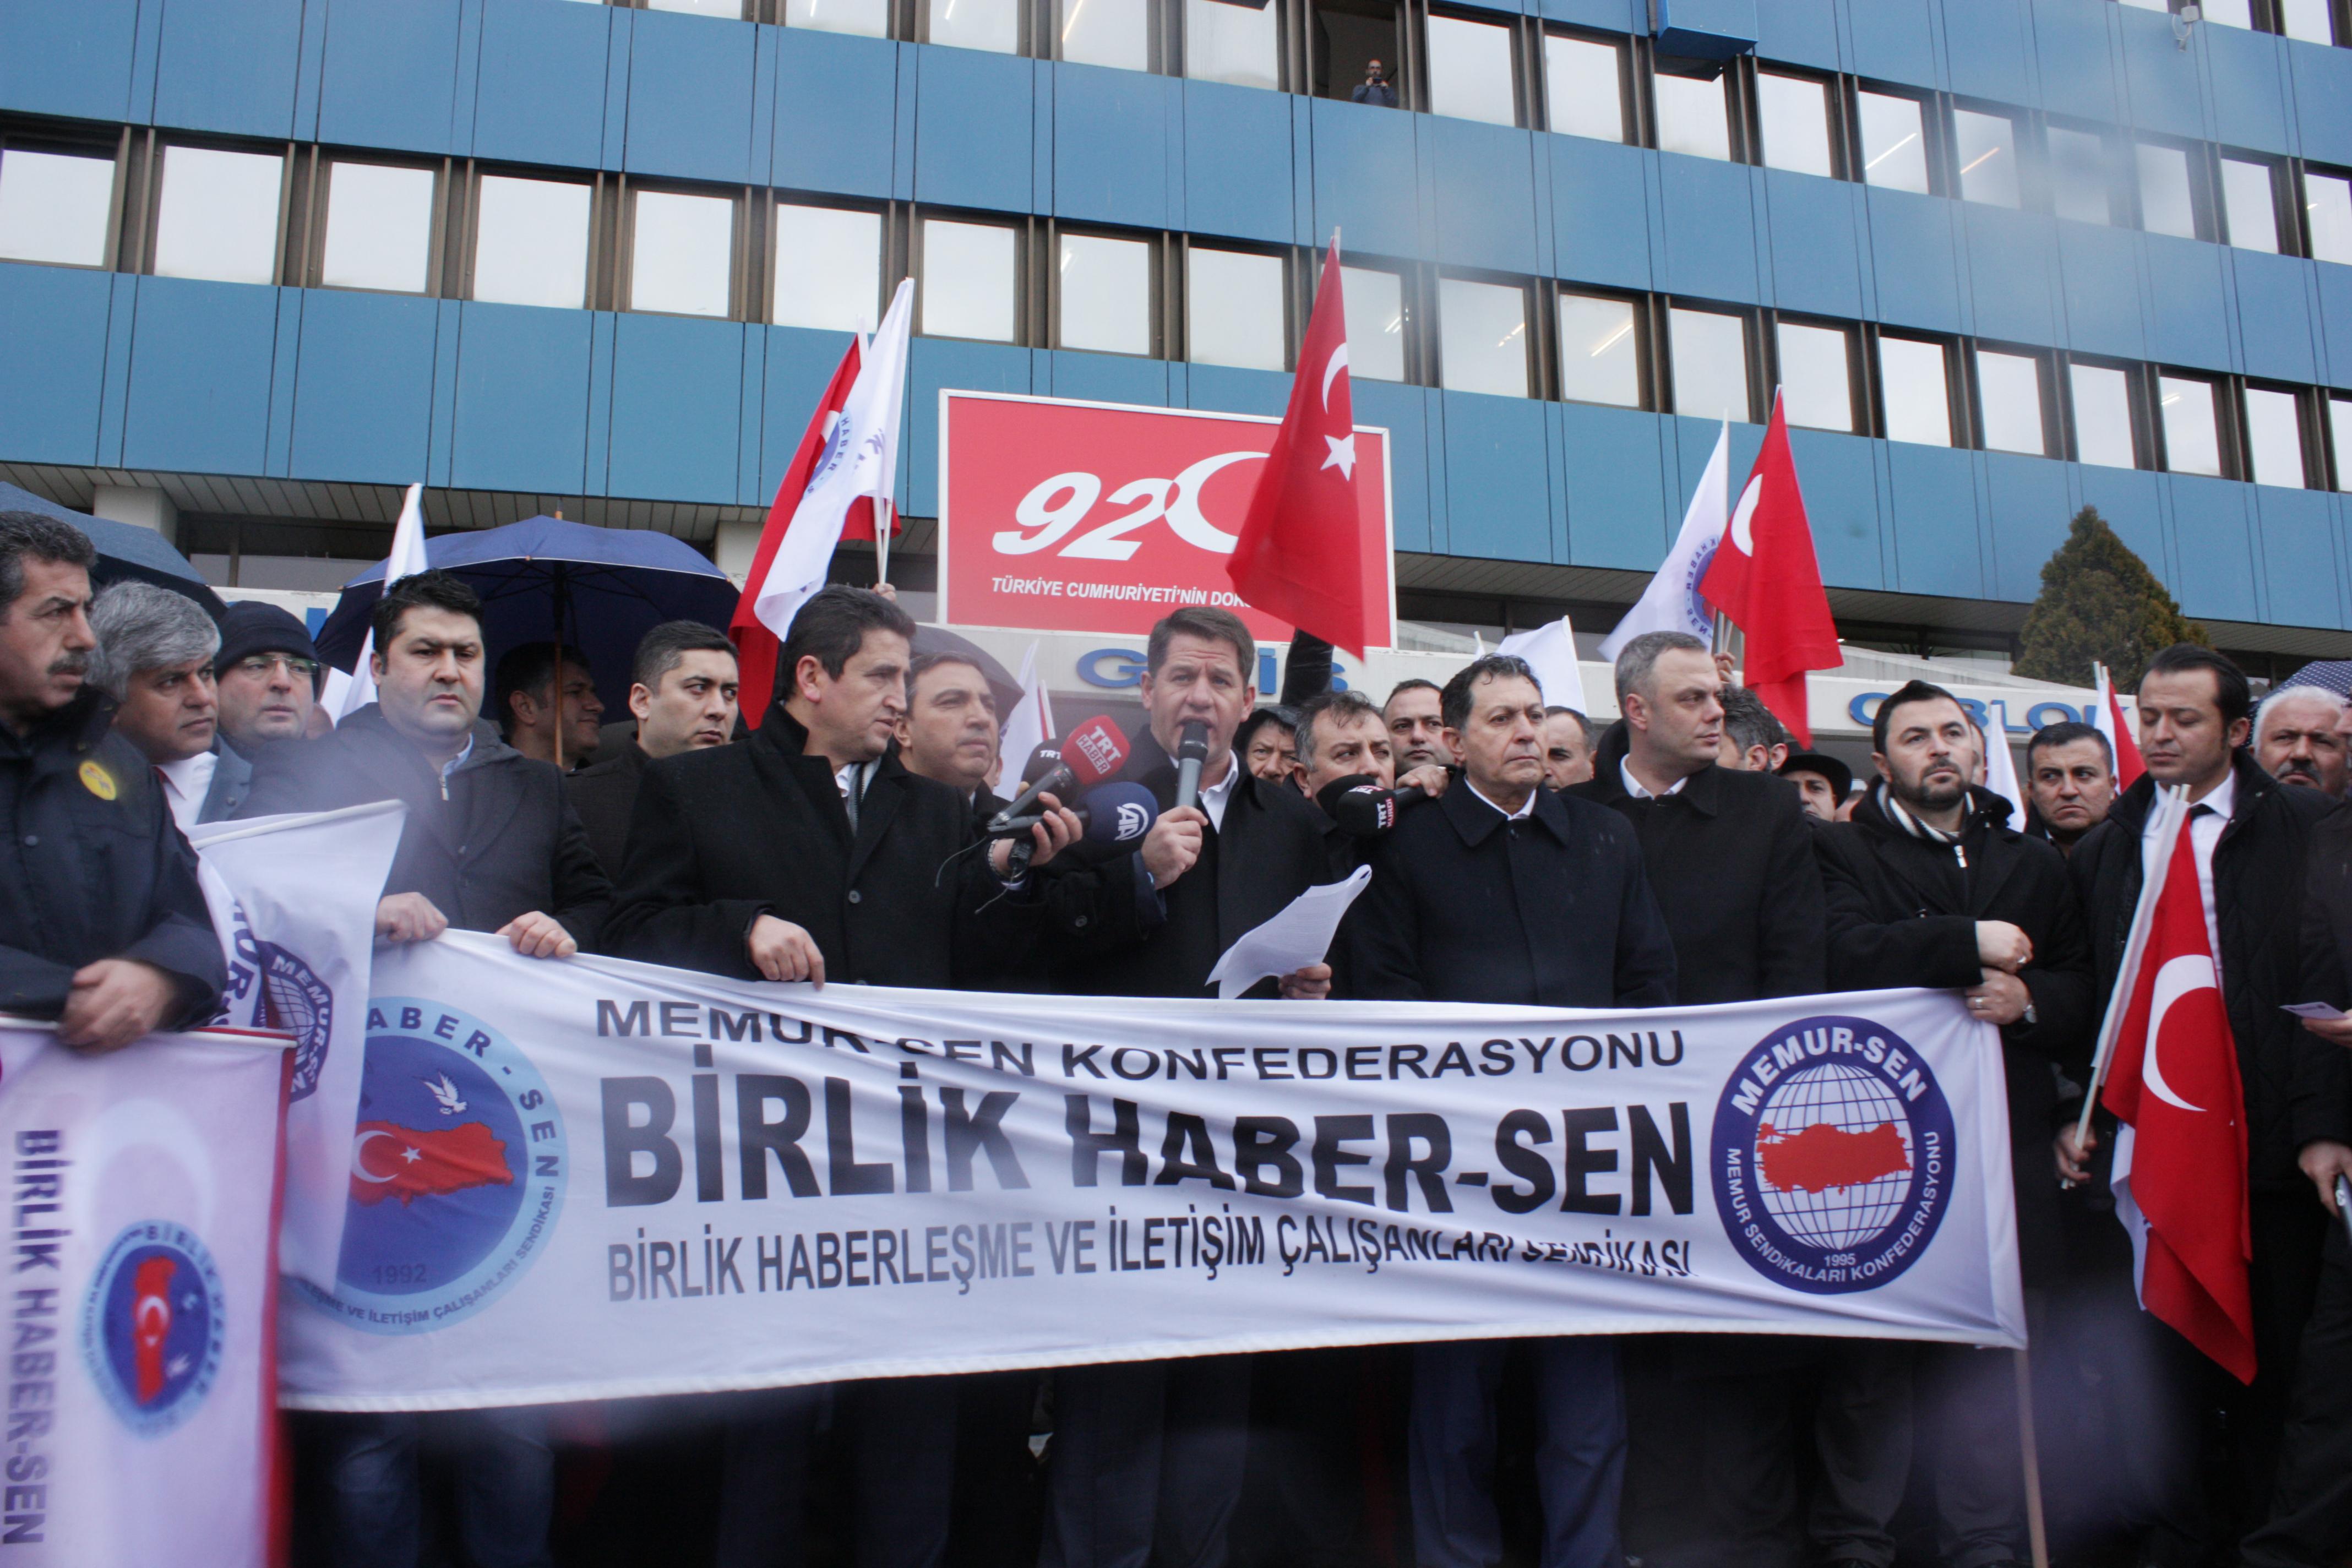 """CHP'Lİ GÖK'ÜN, TRT' DEKİ TUTUMU VANDALLIKTIR"""